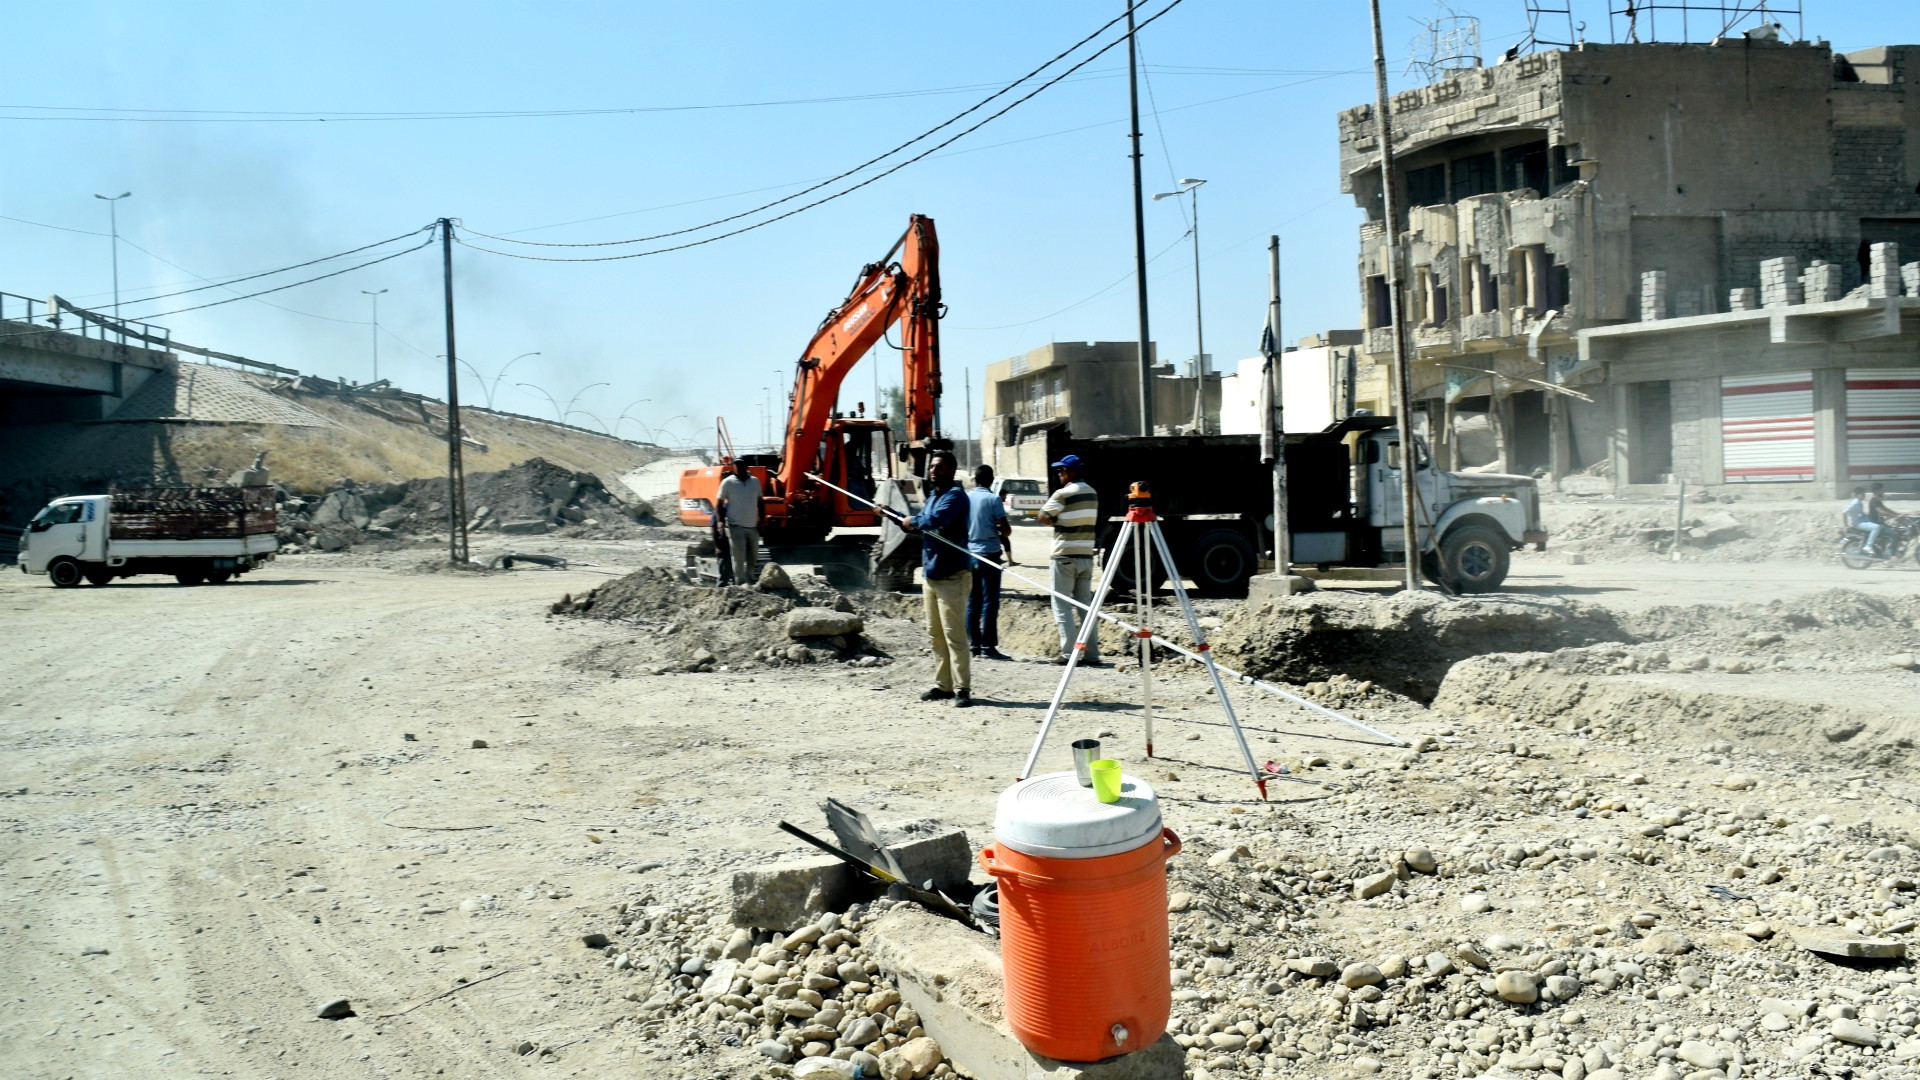 Wiederaufbauarbeiten in Mossul   © Jacques Berset